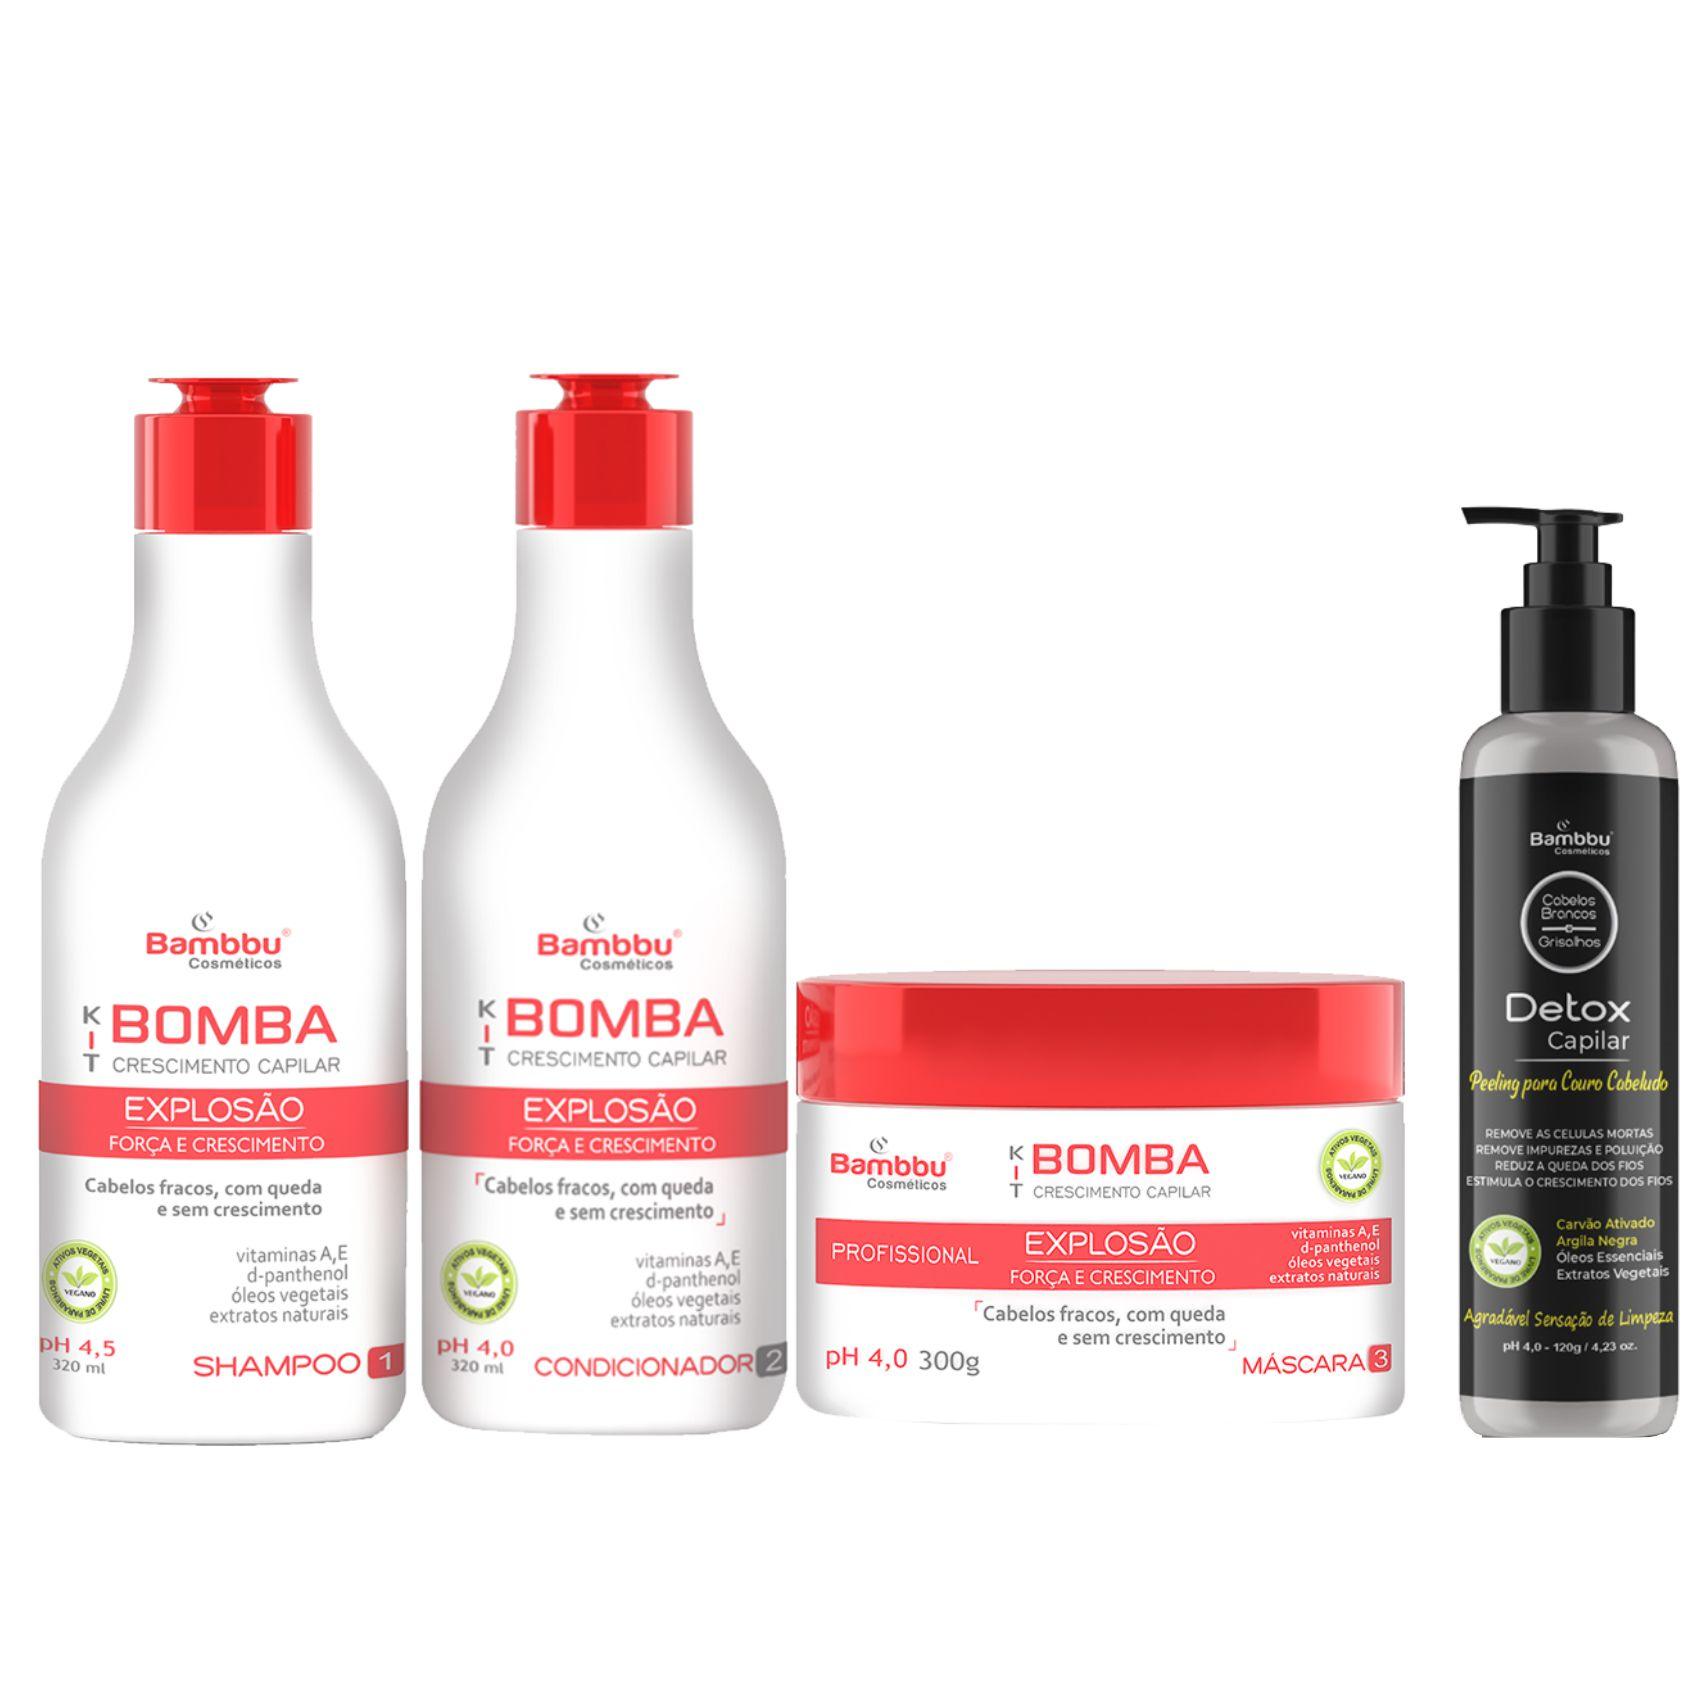 Kit Bomba Crescimento e Detox Capilar Couro Cabeludo (Kit Bomba 3 passos)